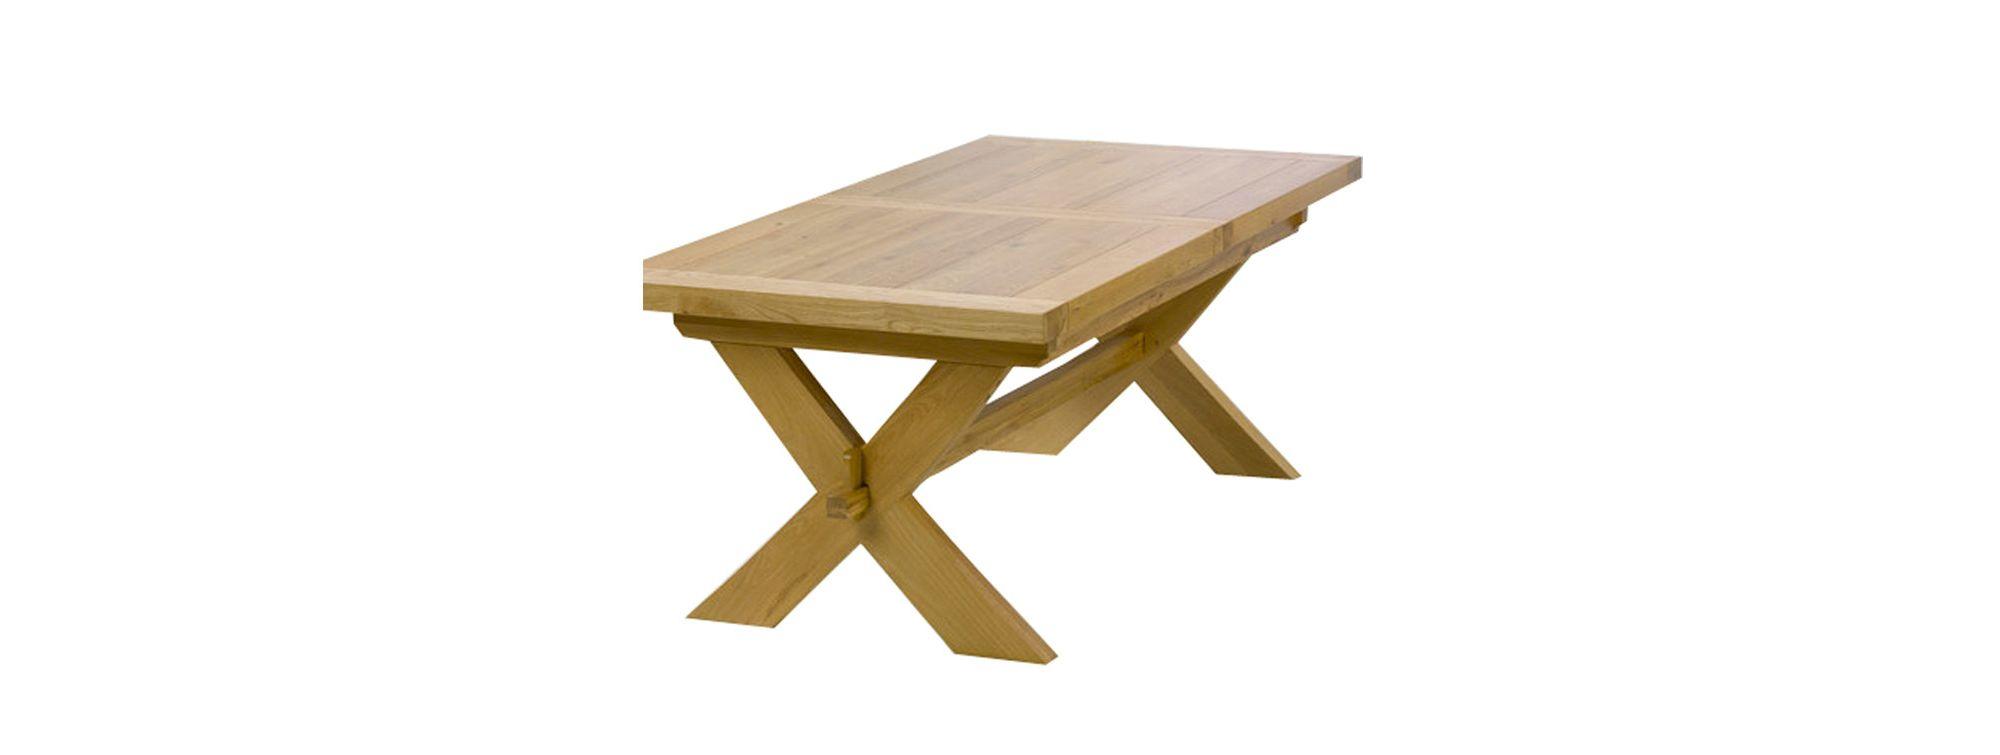 Extending Table 187 Tesco Extending Tables : 119 8380PI1000015MNwid2000amphei2000 from extendingtable.co.uk size 2000 x 2000 jpeg 52kB